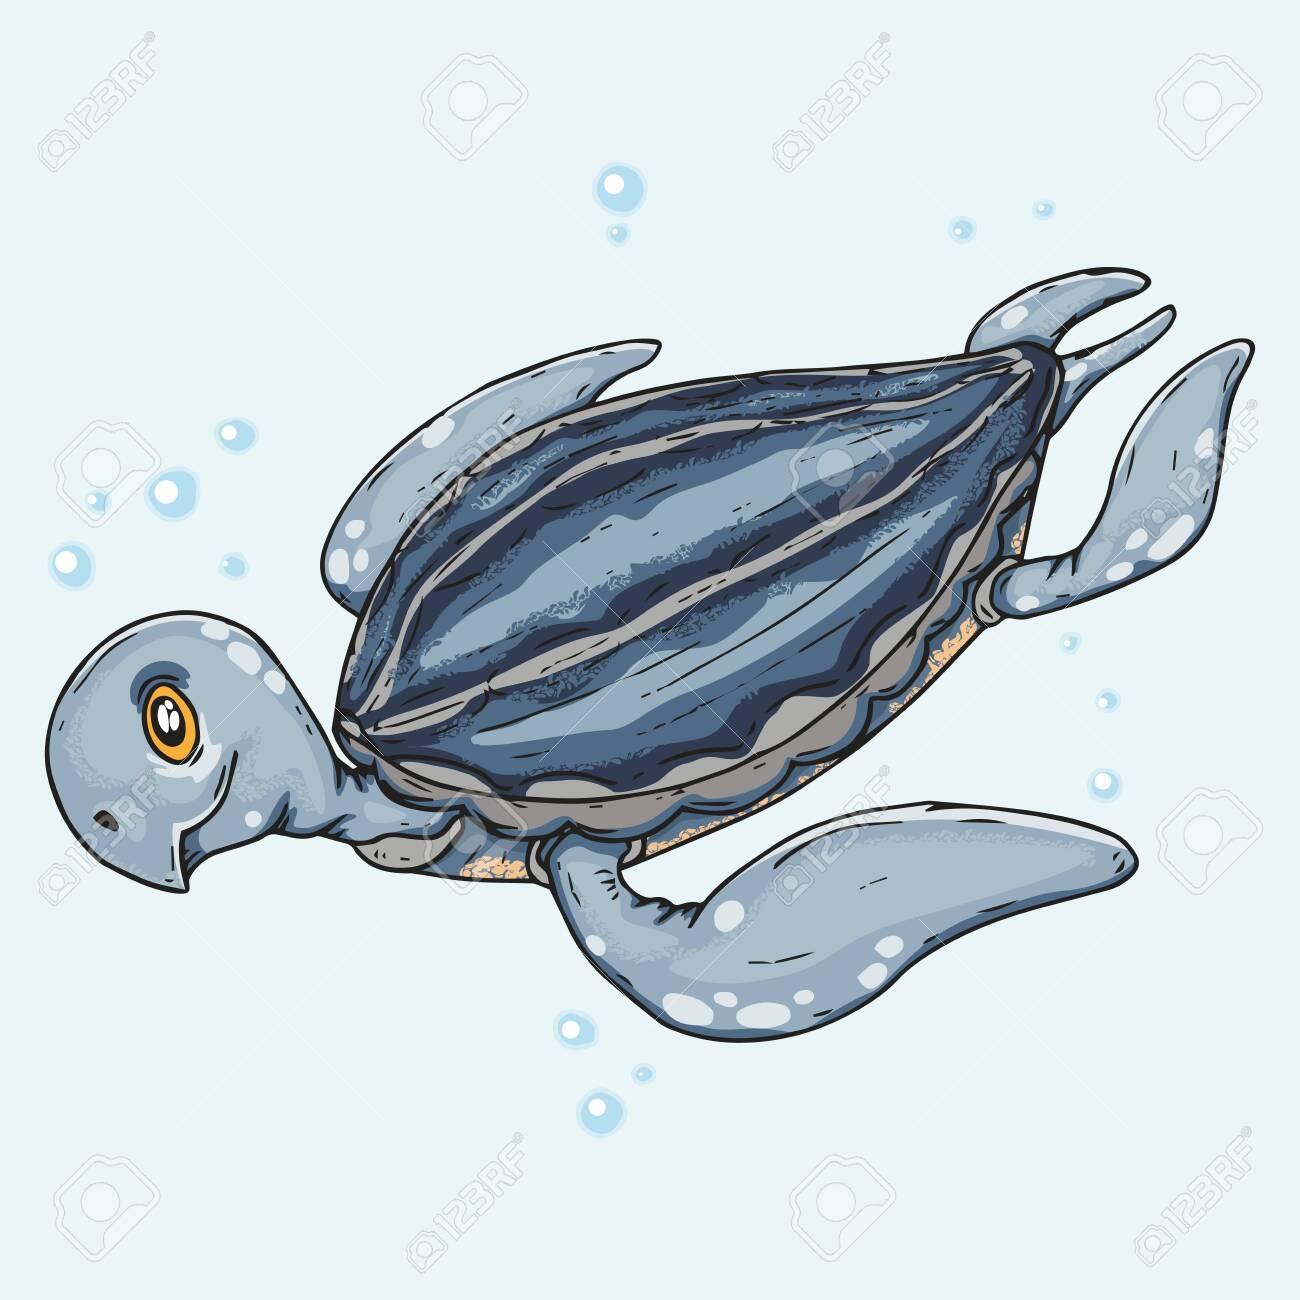 Sea Turtle Icon Vector Illustration Of A Cute Sea Turtle Hand